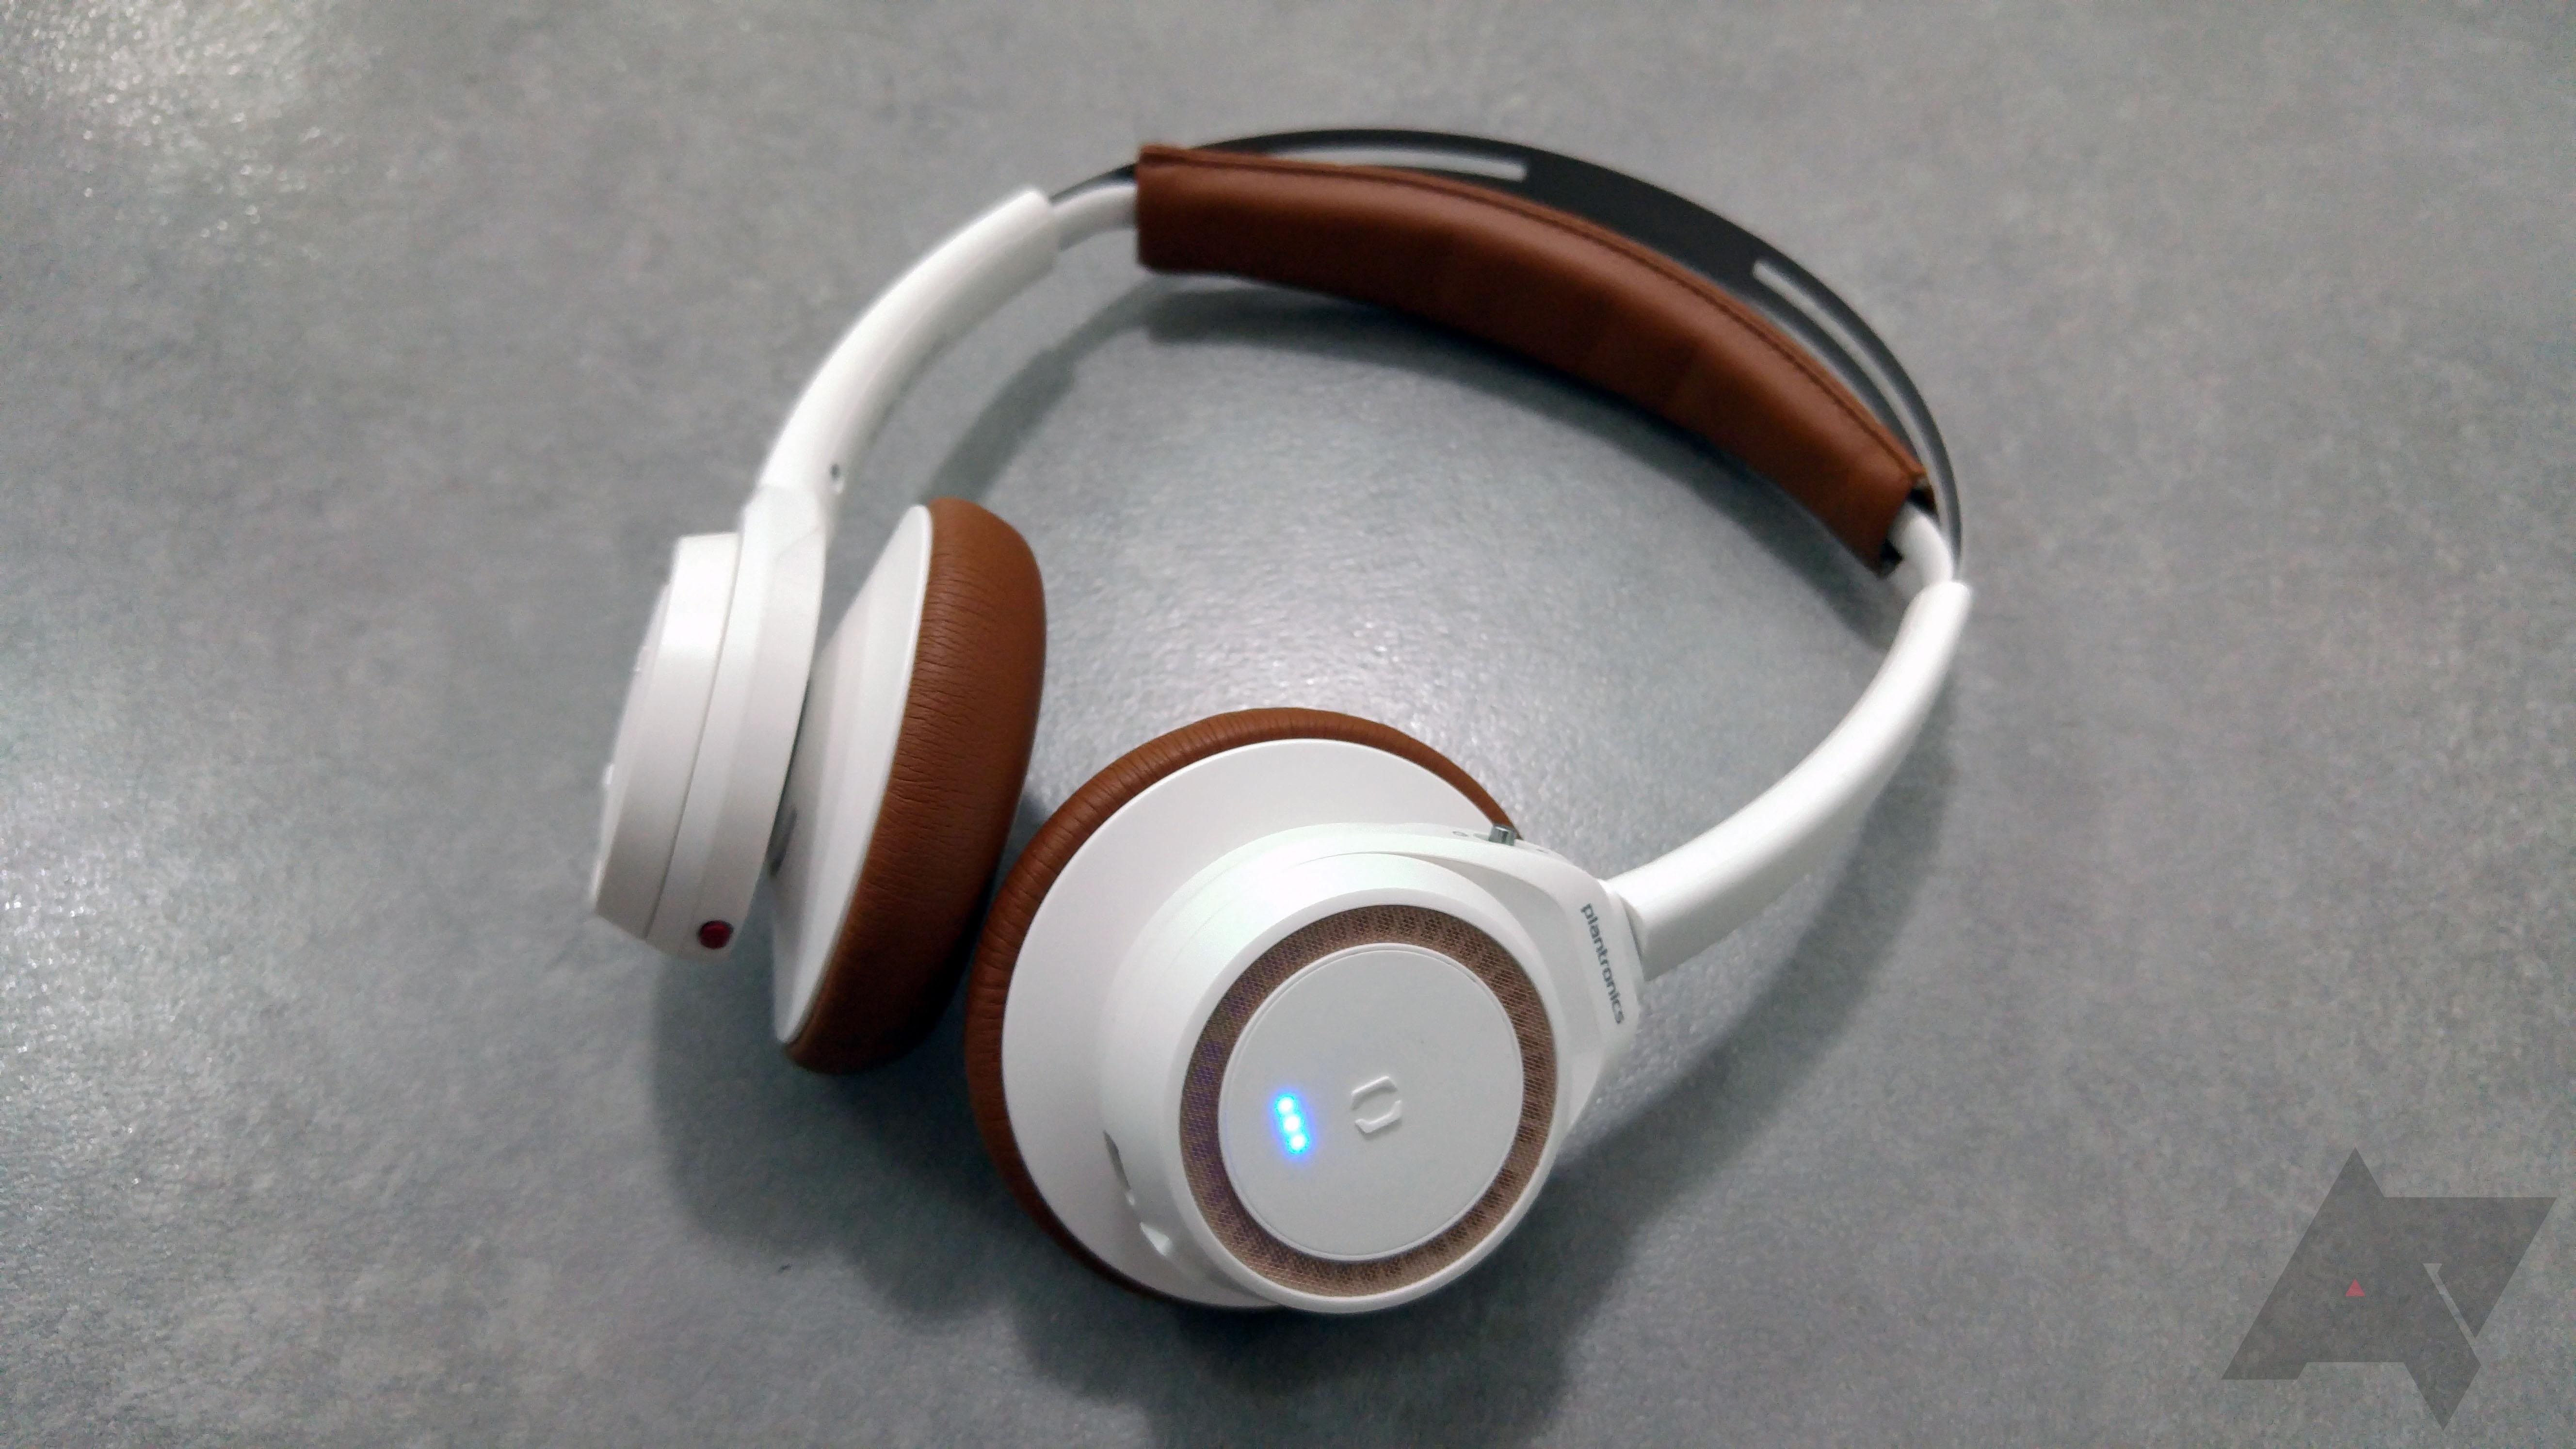 70ce7fa1eea Hands-On] Plantronics Announces The BackBeat SENSE, A Smart ...